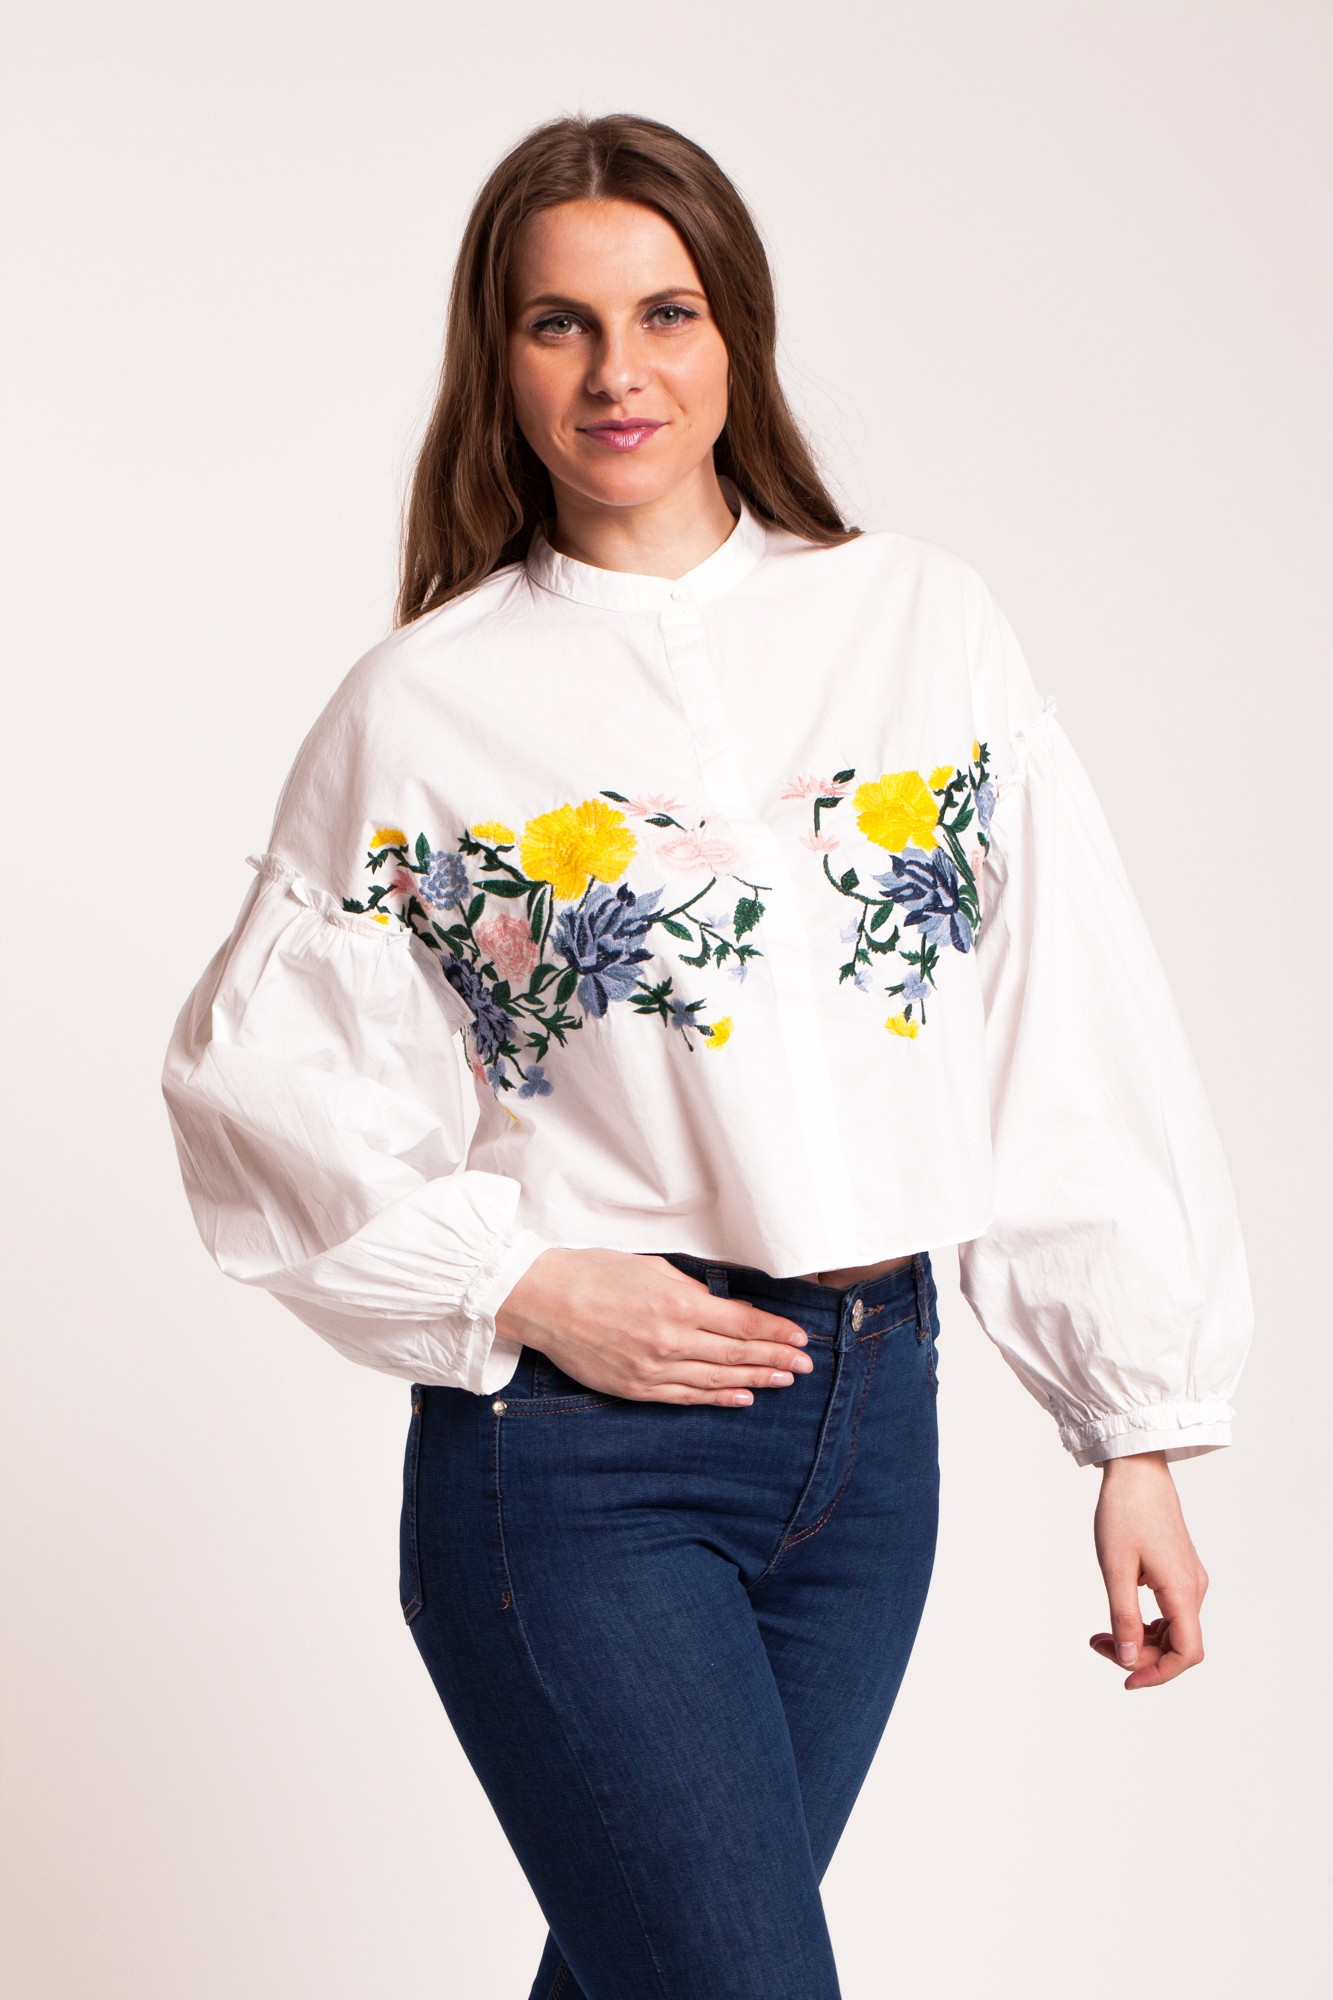 Camasa alba scurta supradimensionata cu broderie florala